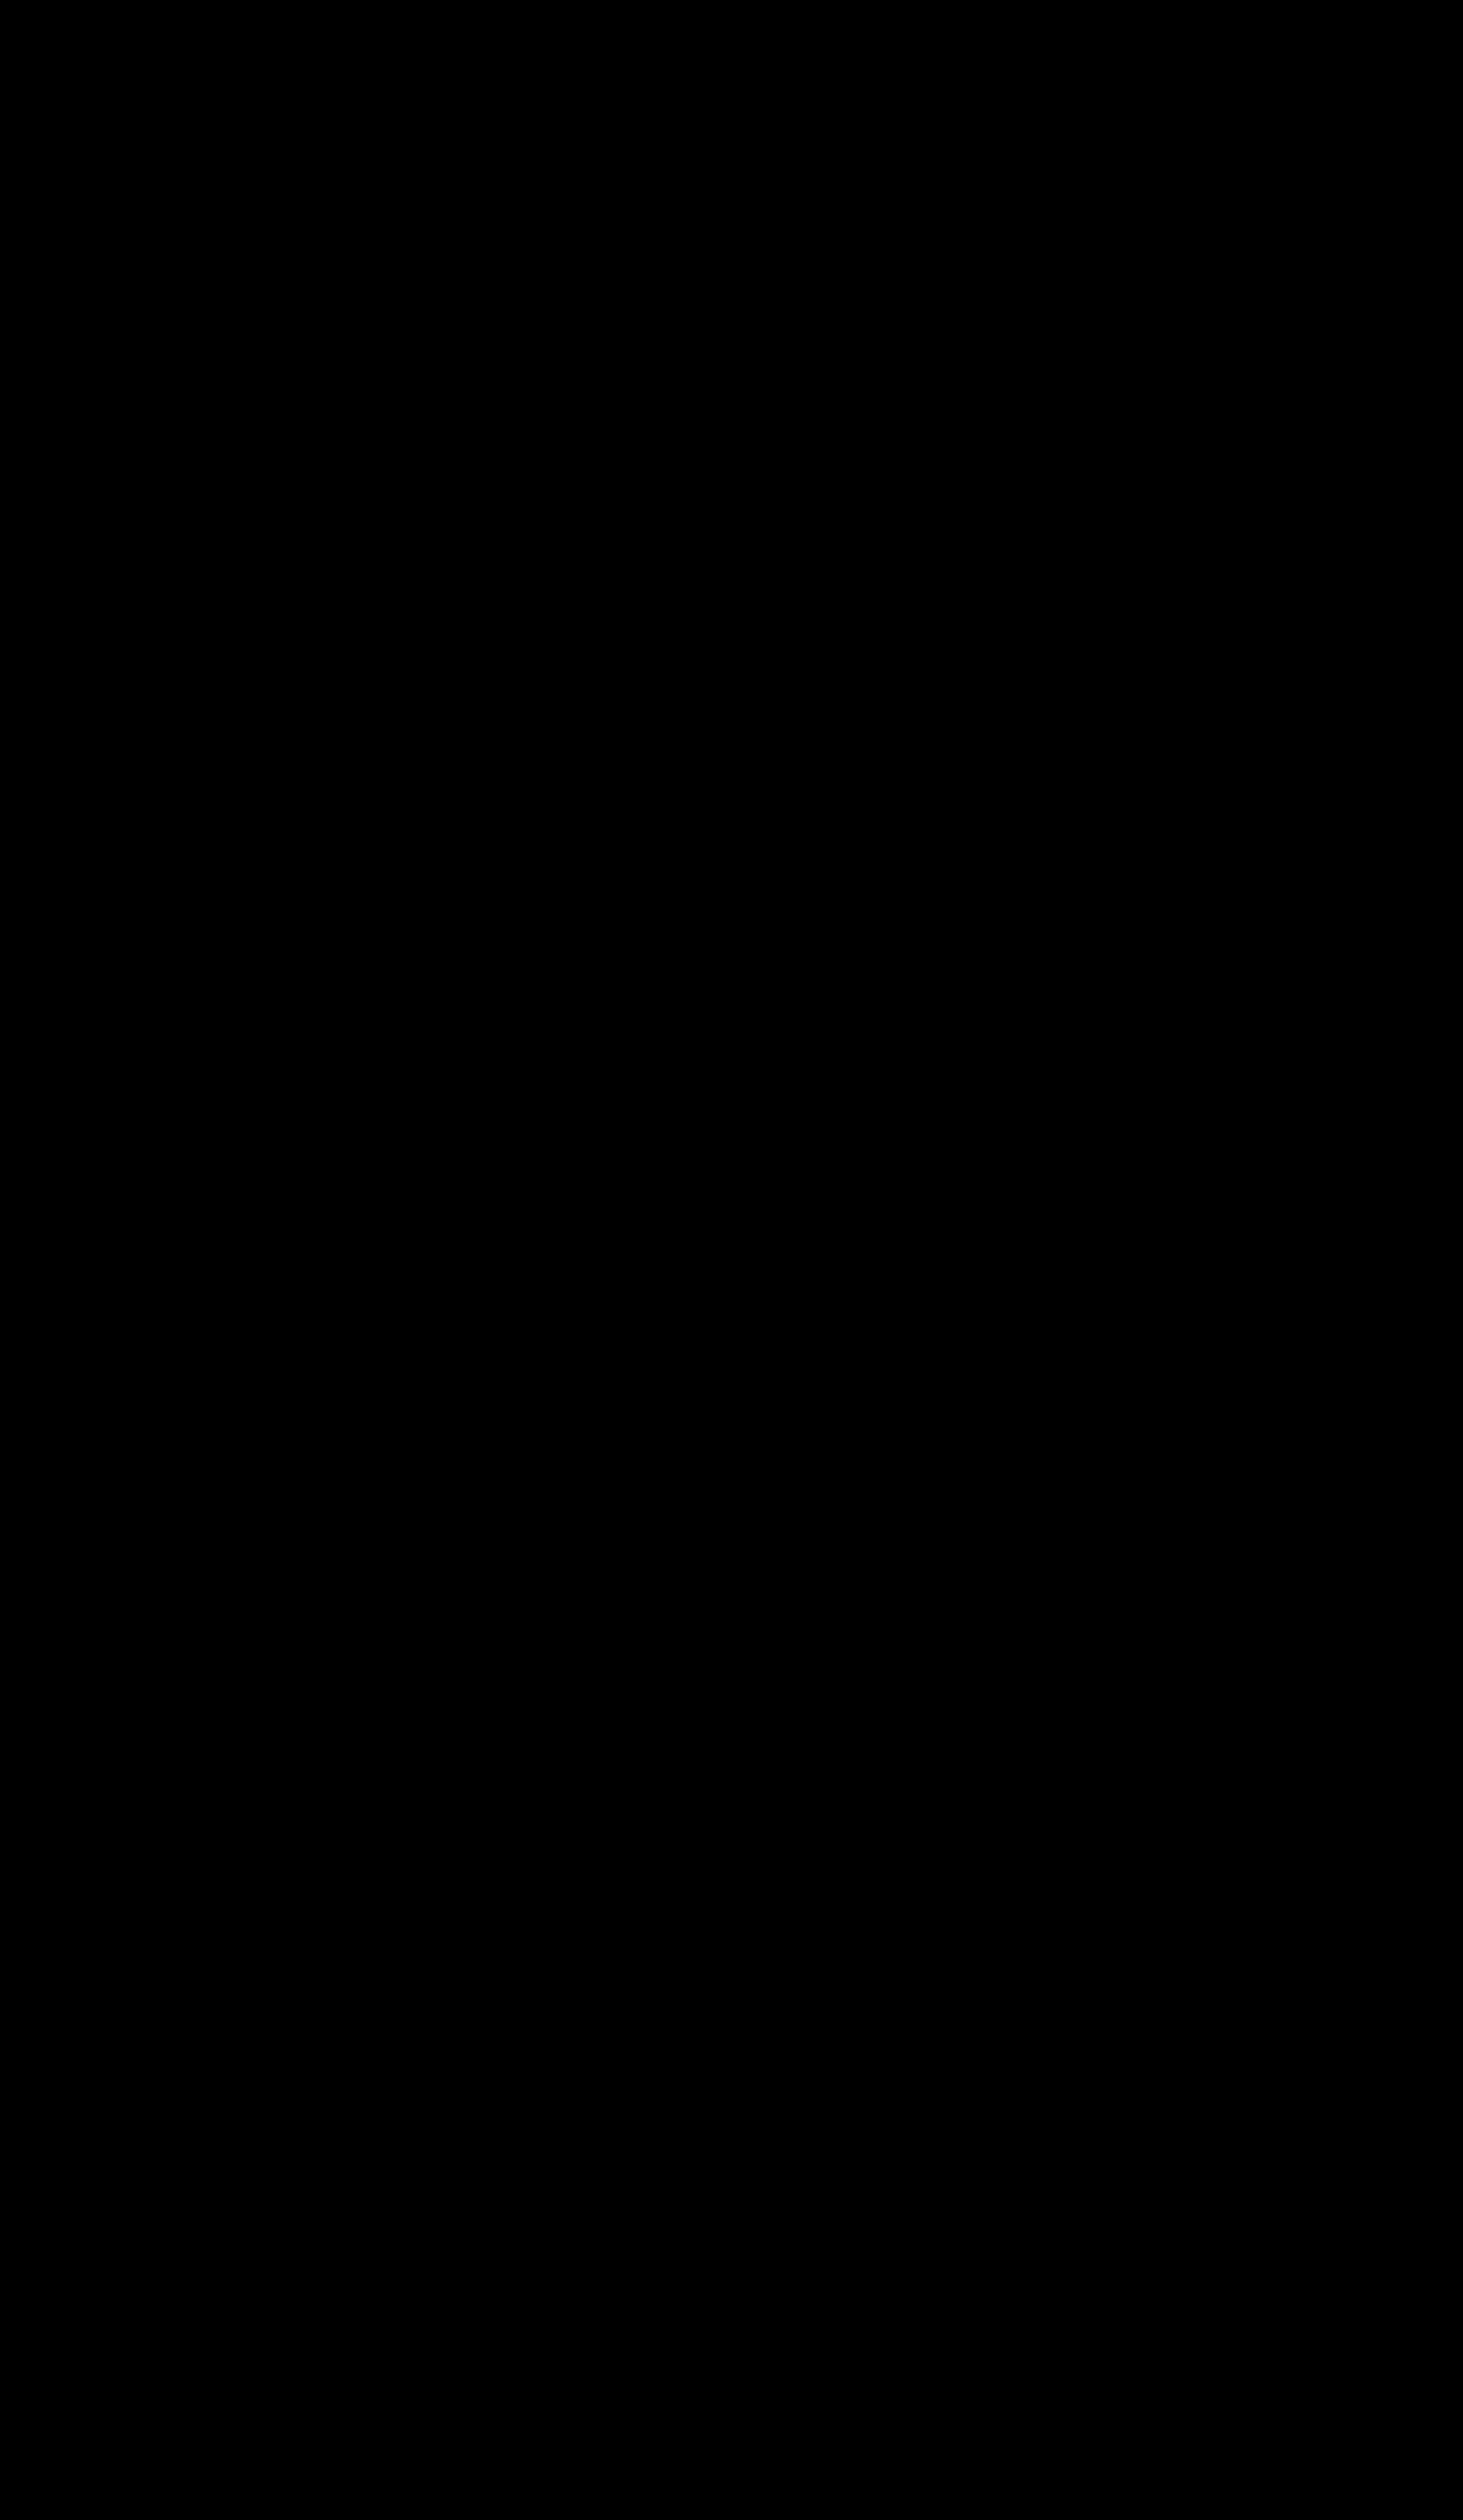 powerup login